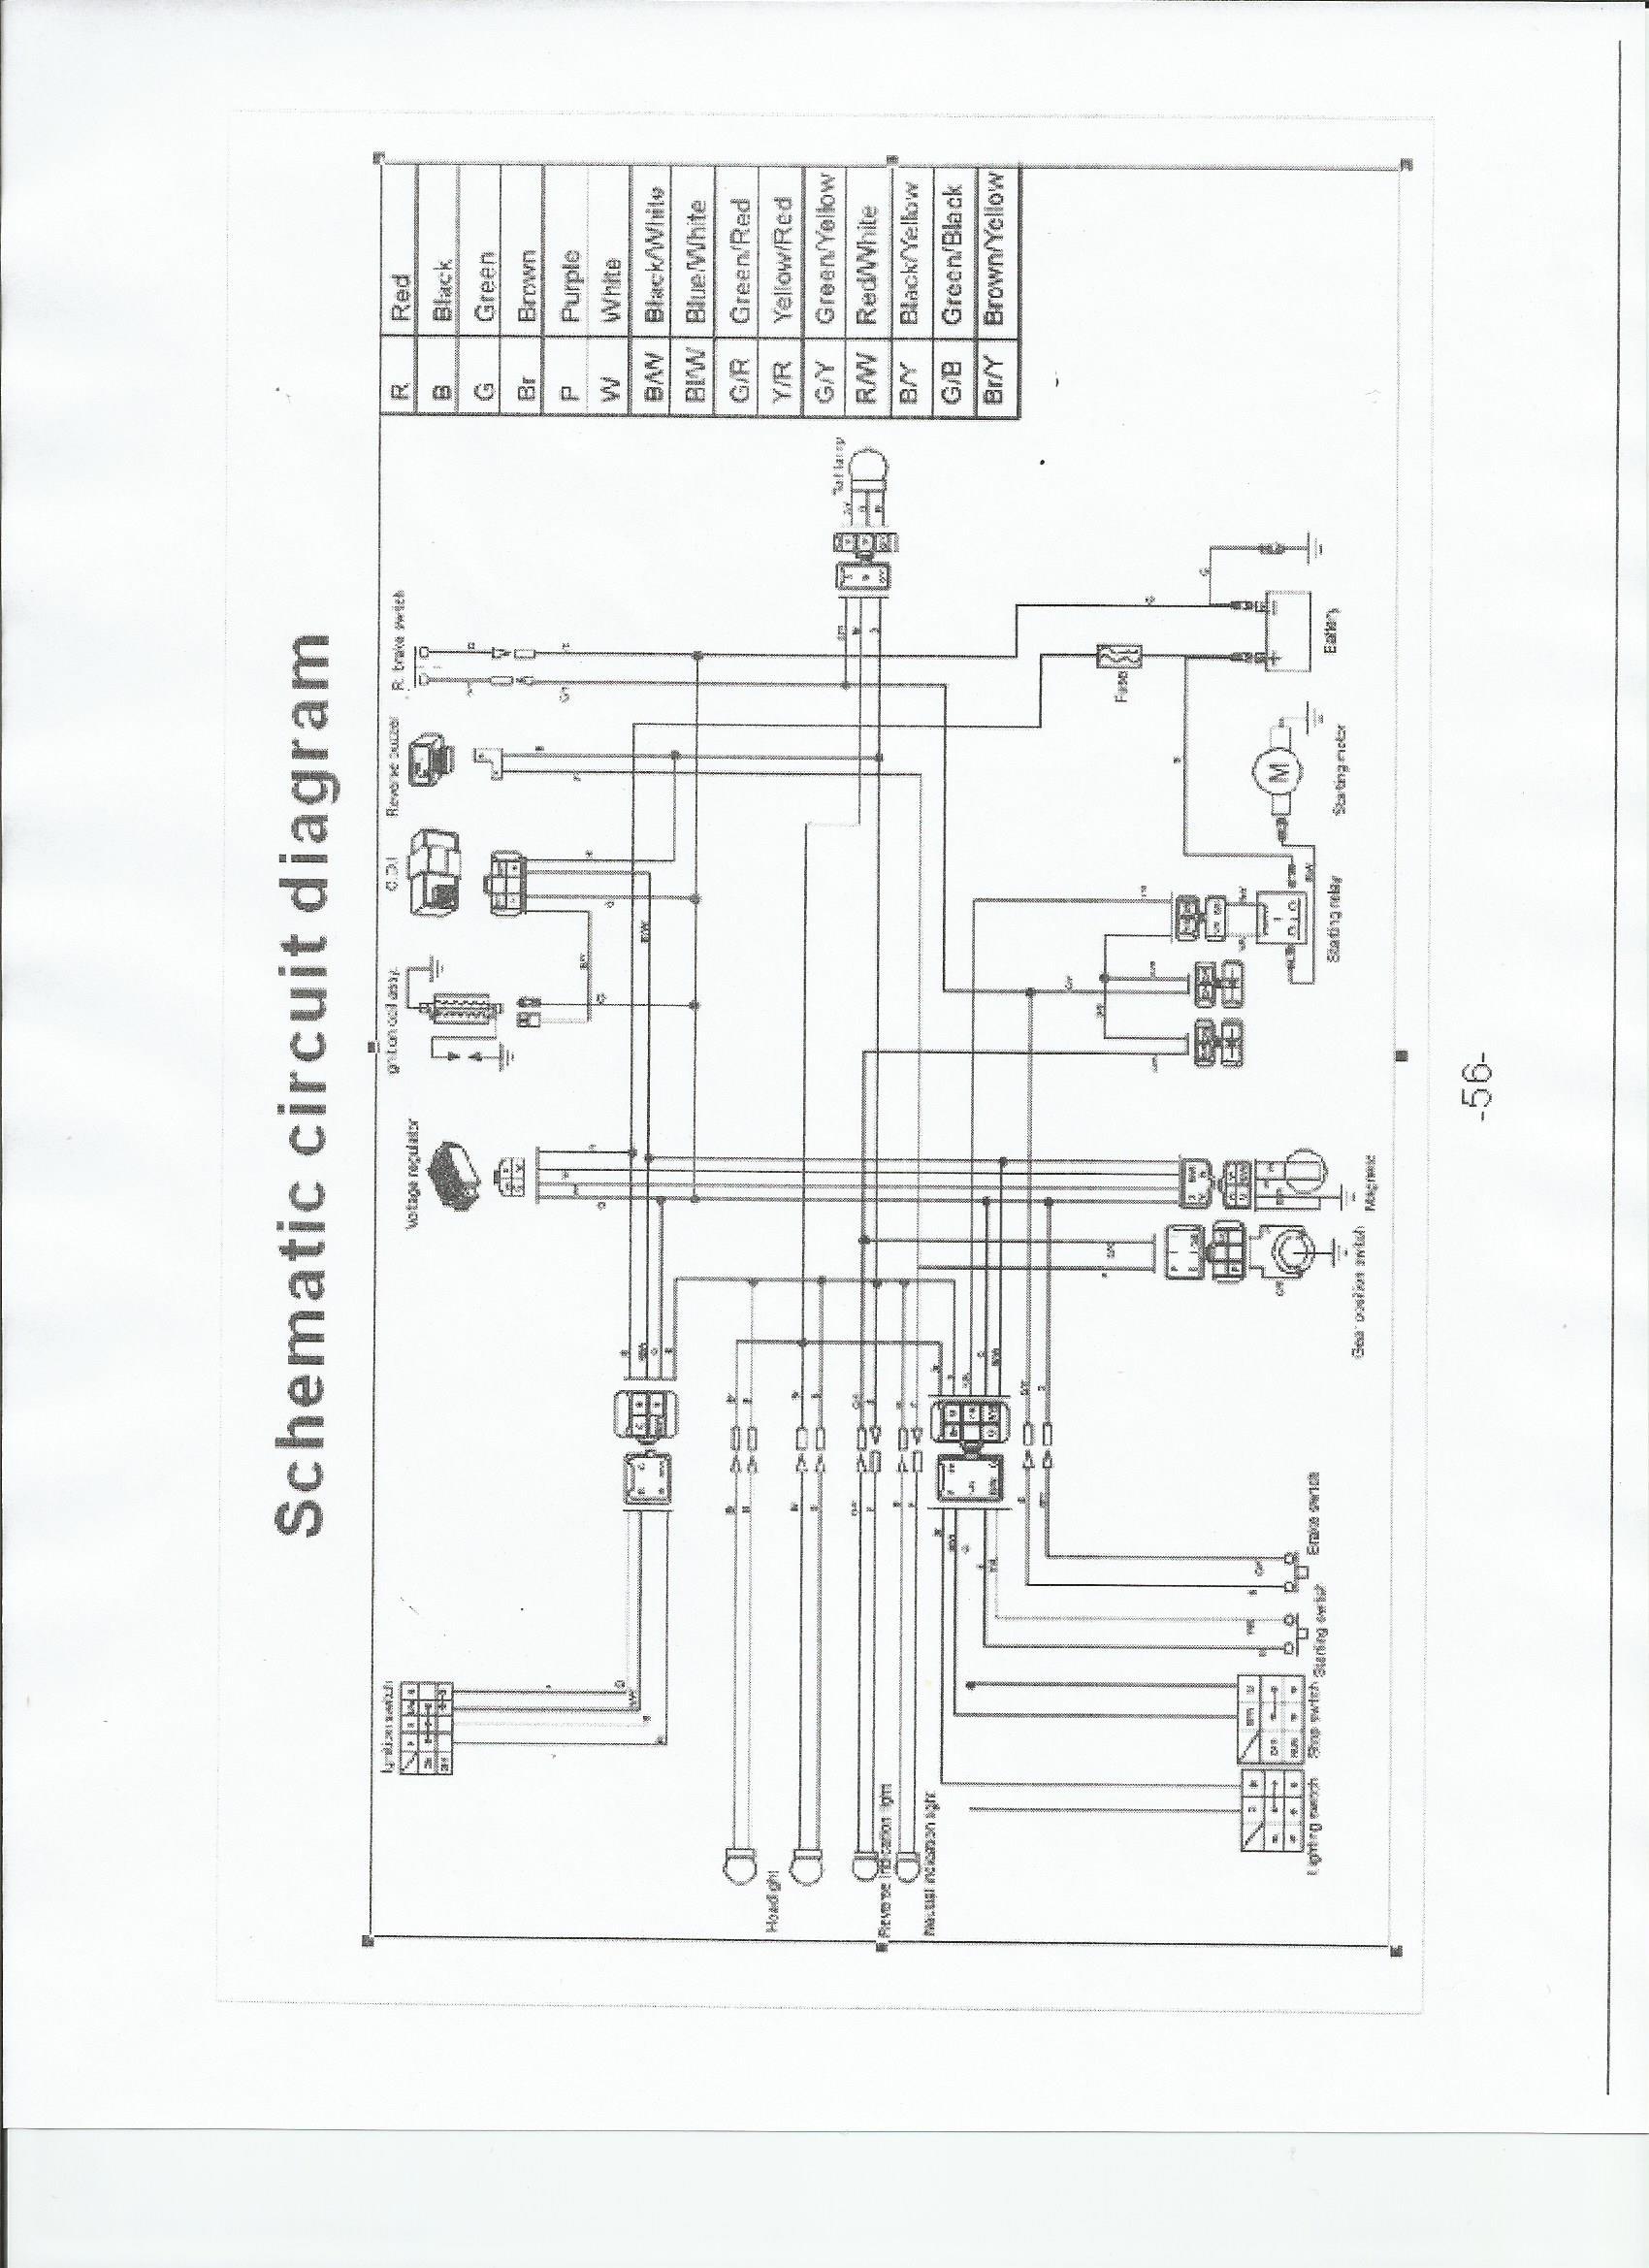 107 atv wiring harness wiring diagram show 107 atv wiring harness [ 1700 x 2338 Pixel ]